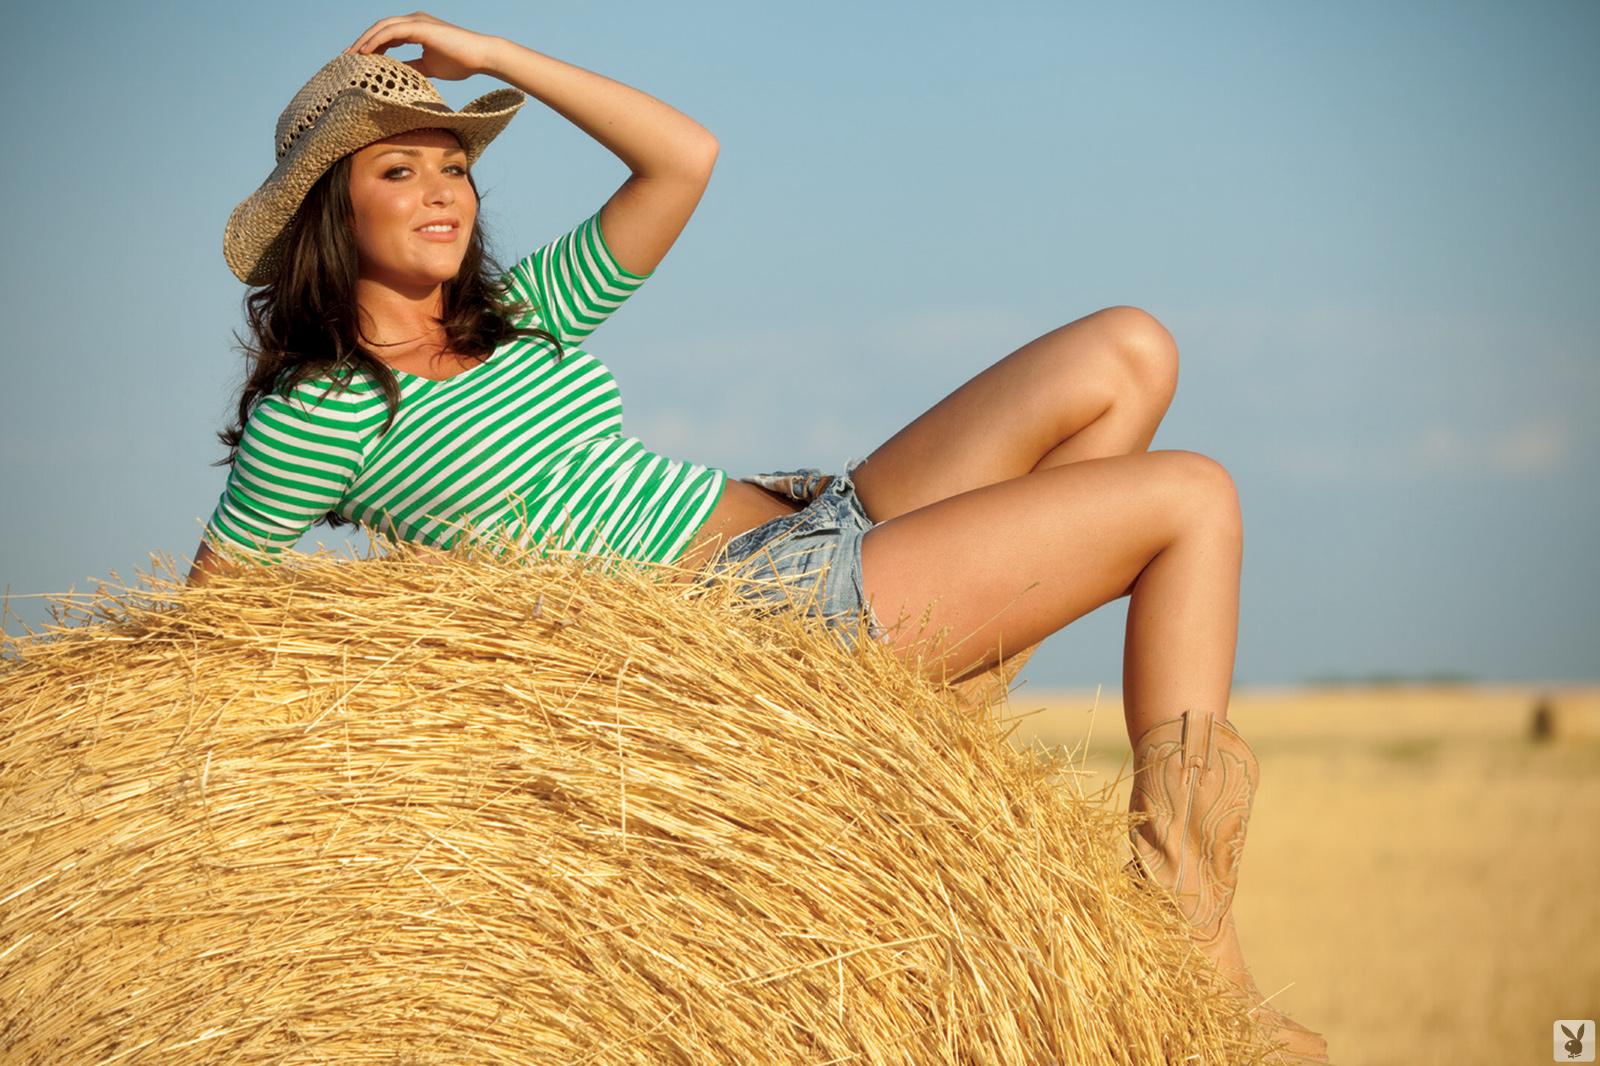 rainy-day-jordan-barn-naked-cowgirl-ranch-playboy-02